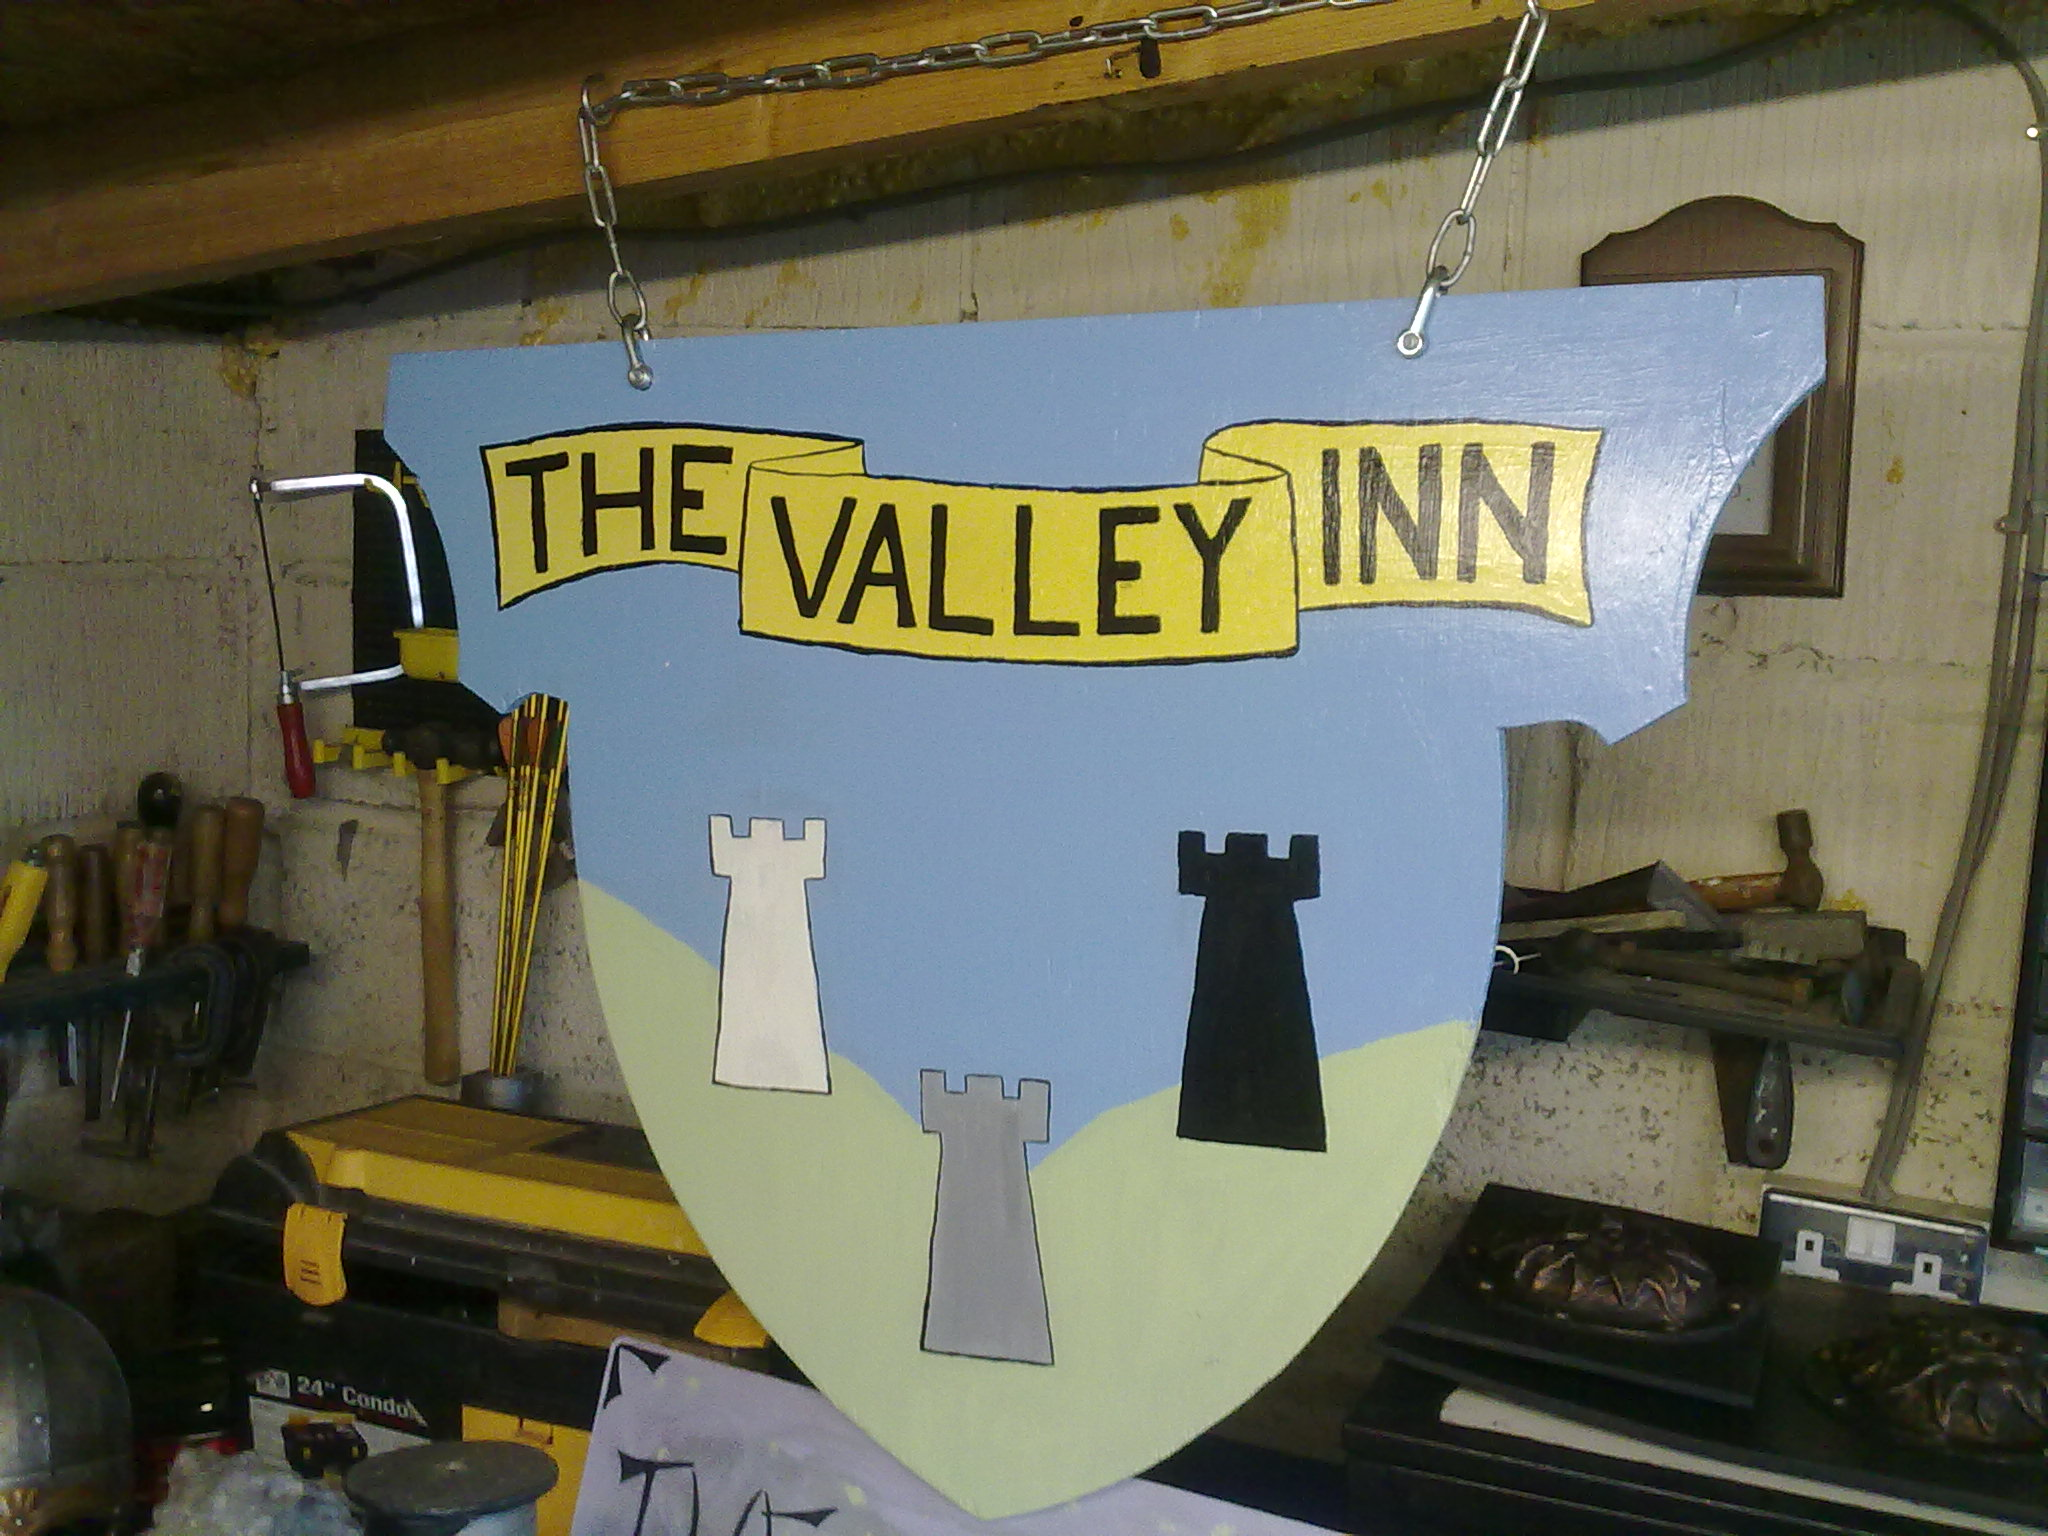 The Valley Inn Tavern sign